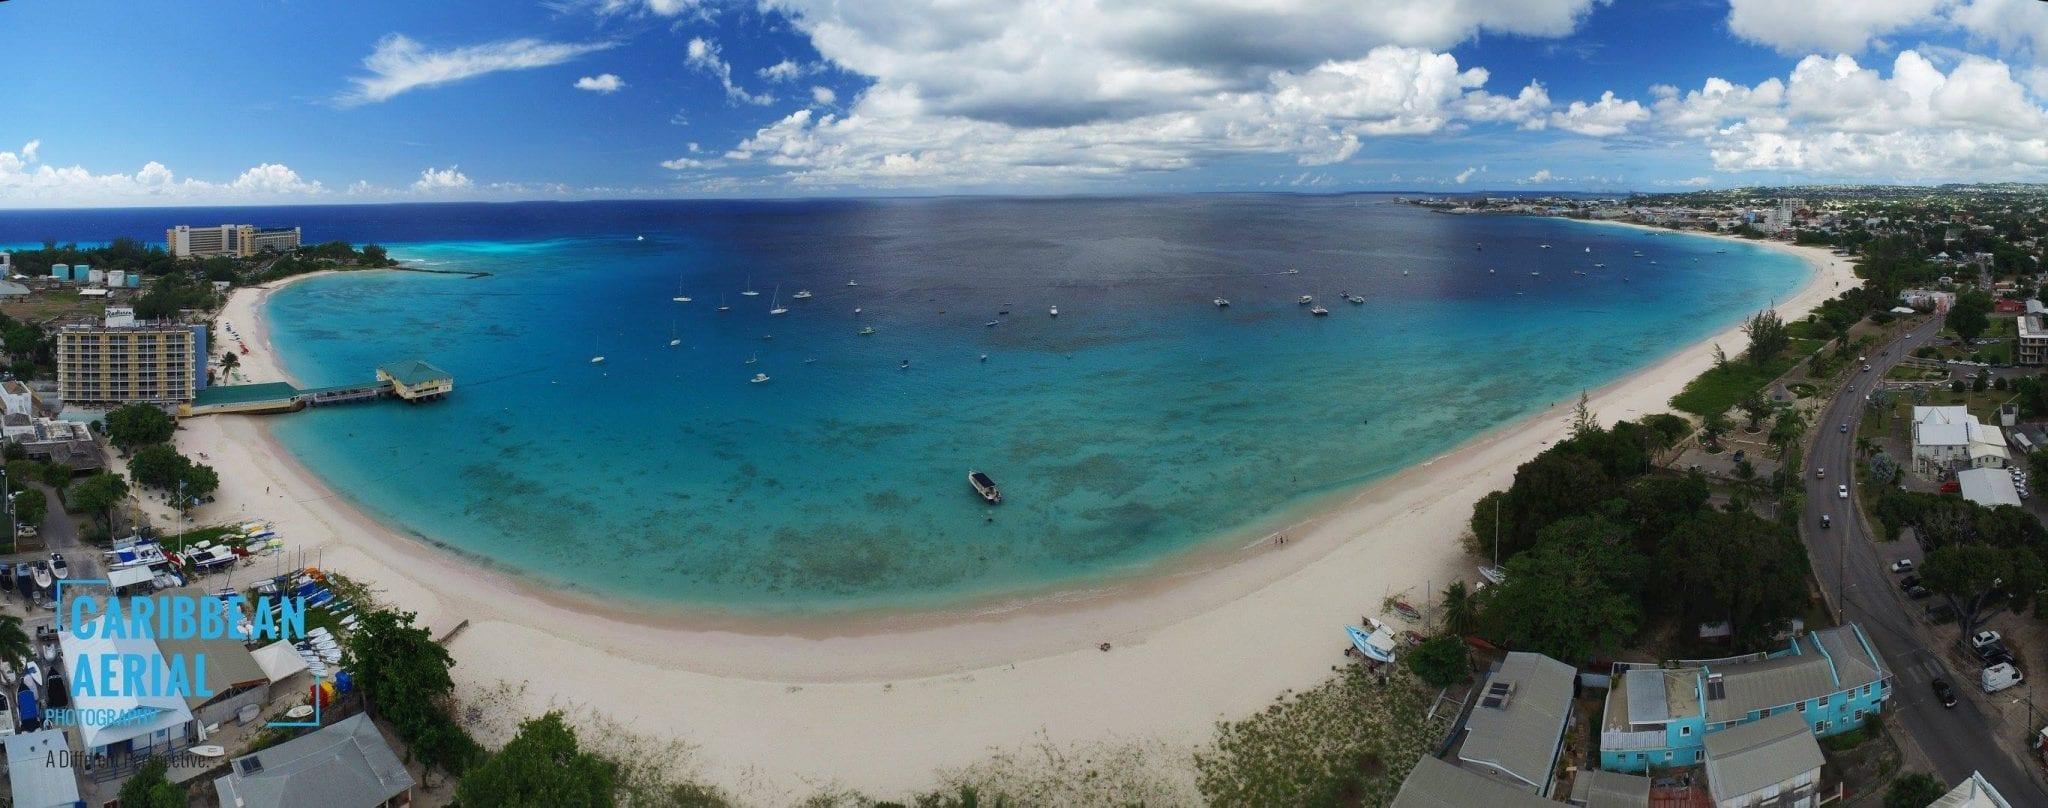 caribbean-aerial-photography-023